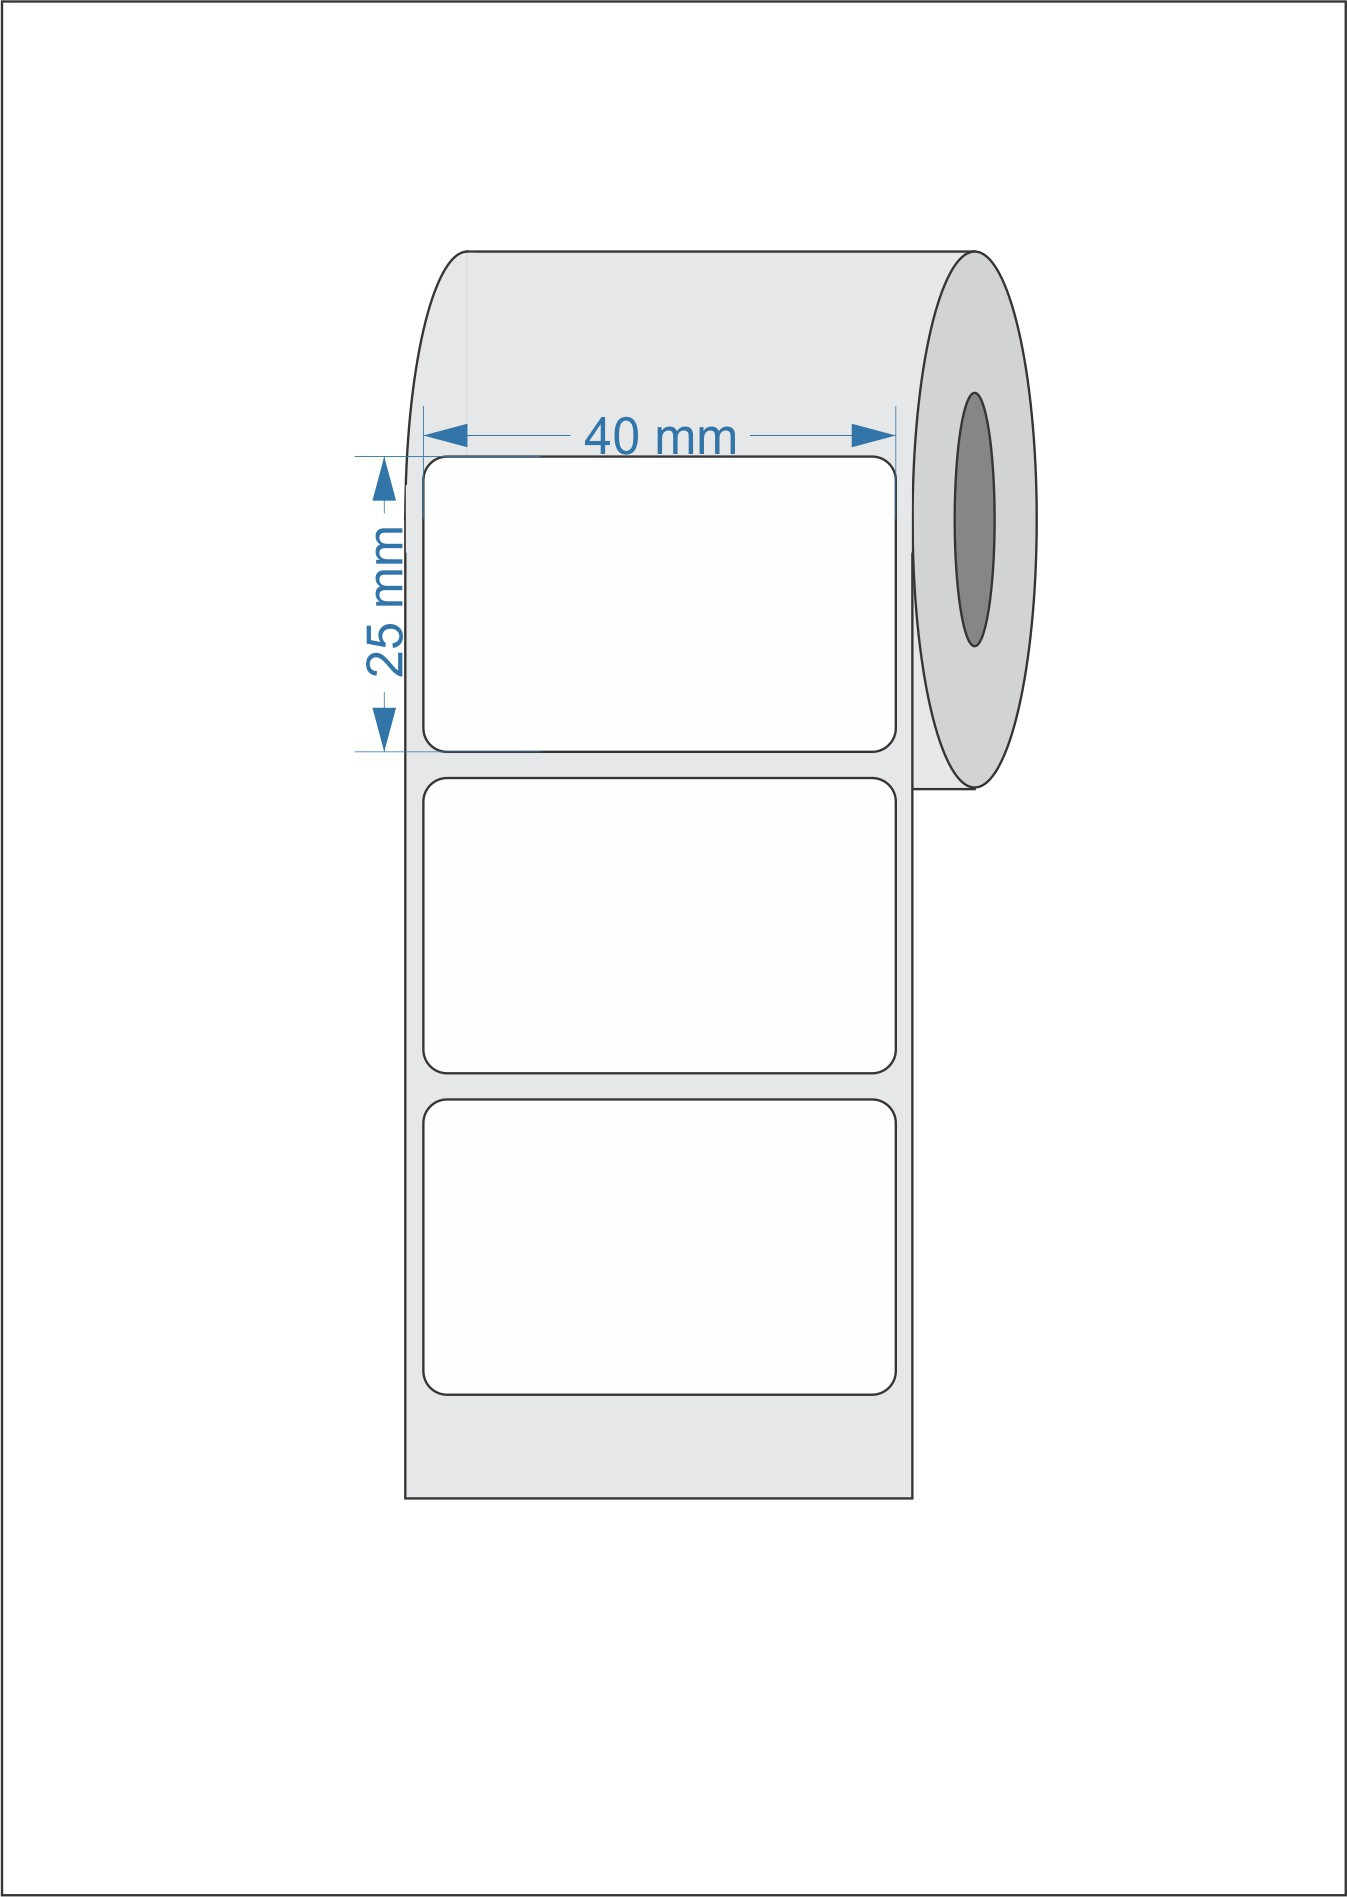 60 Rolos Etiquetas Adesivas 40x25 mm  Térmico 01 Coluna Mercado Envios FULL